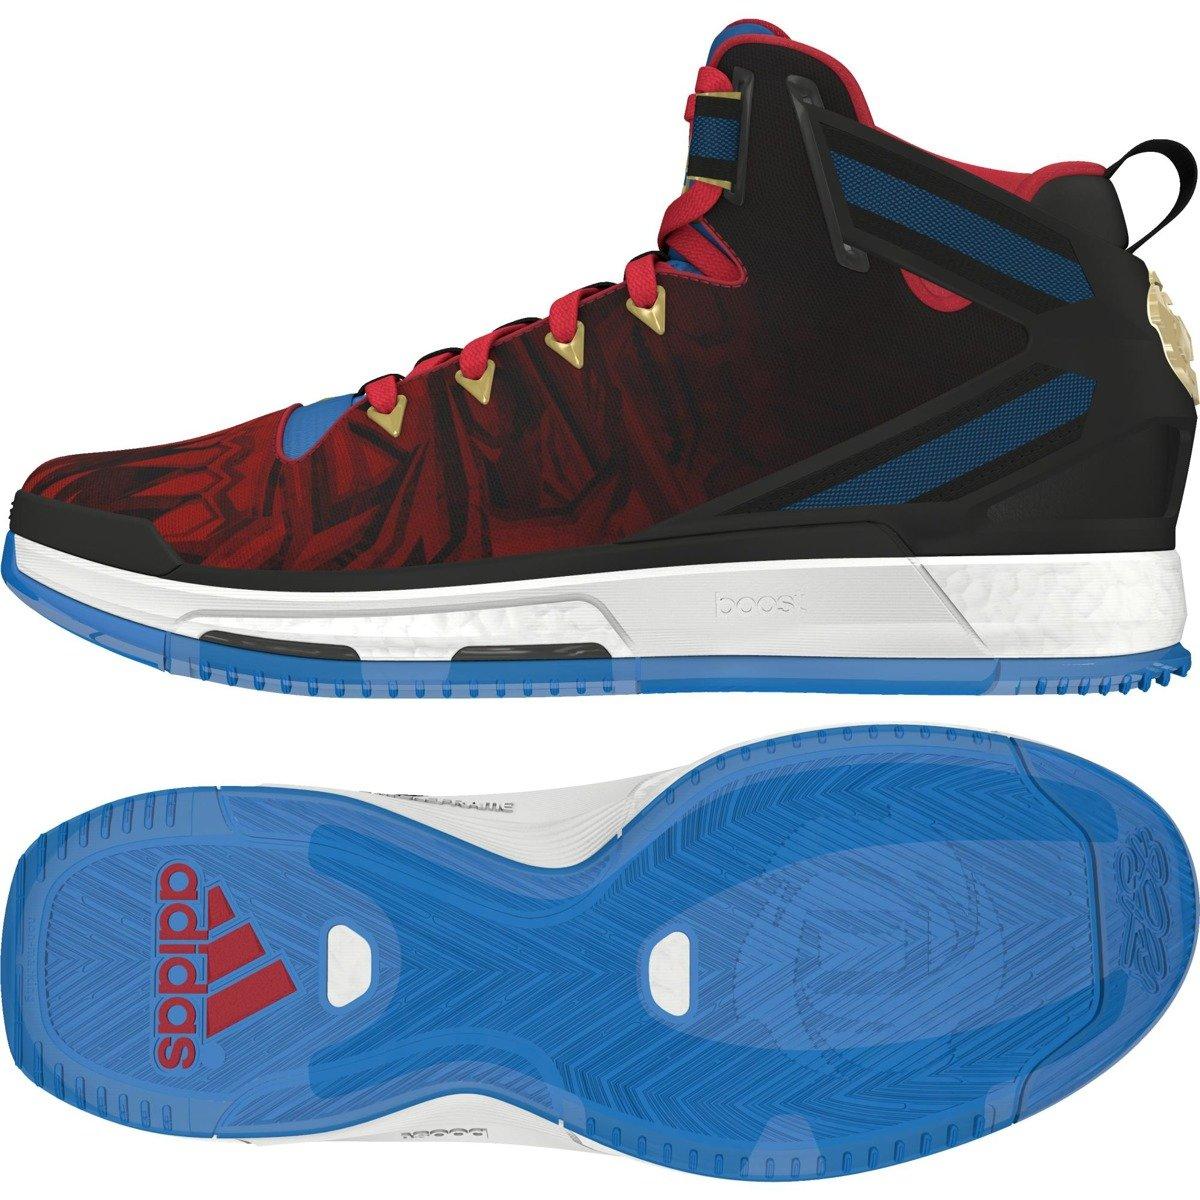 brand new aedd1 b32c3 ... Adidas D Rose 6 Boost Basketball Shoes - F37127 ...